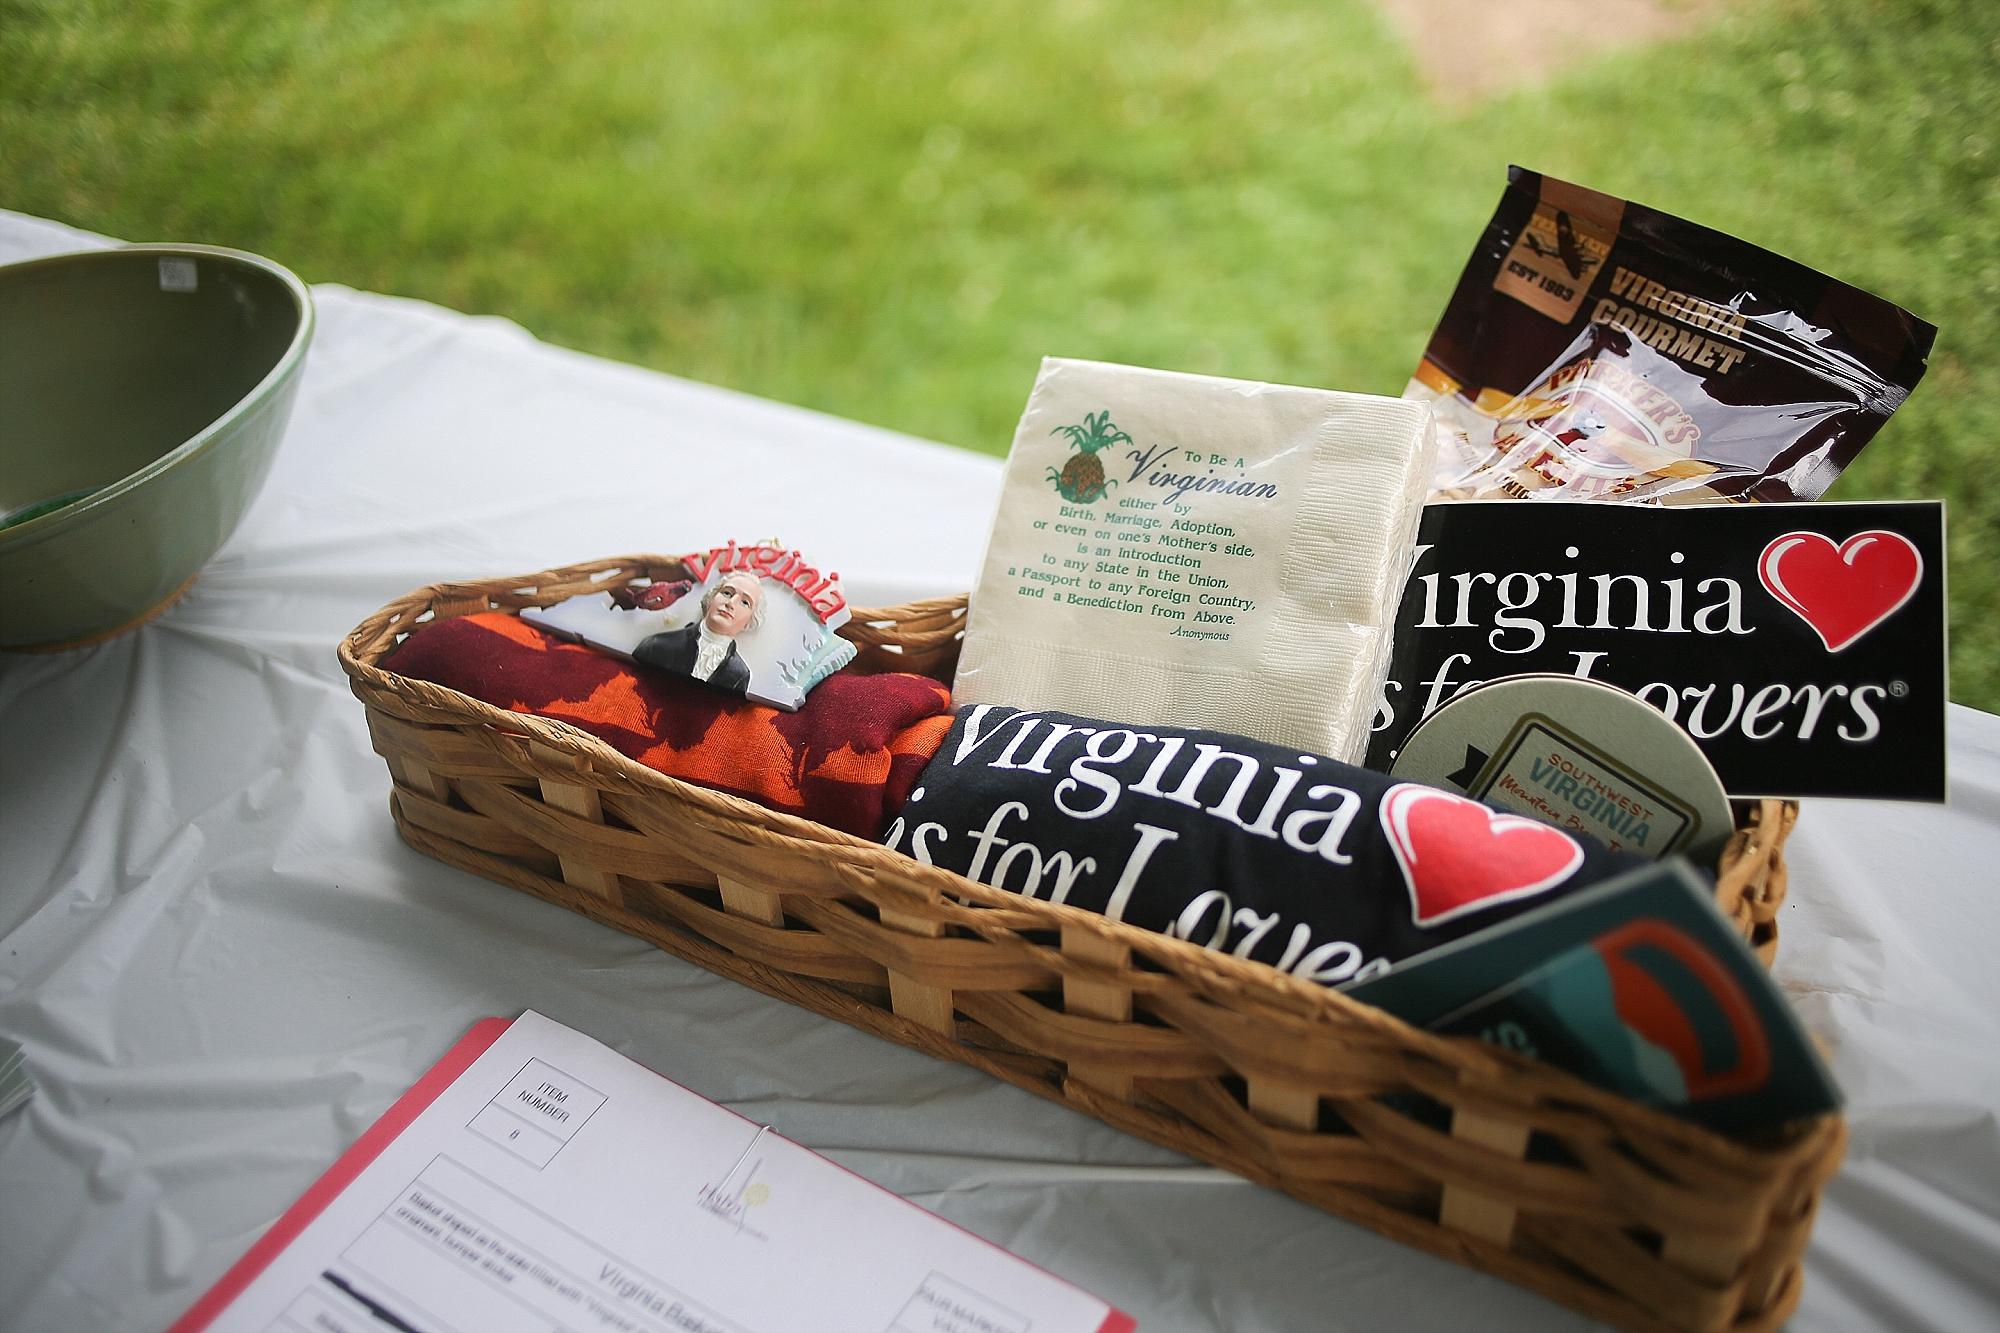 Hahn-Horticulture-Garden-Gala-2018-Virginia-Tech-Blacksburg-Photographers_0027.jpg